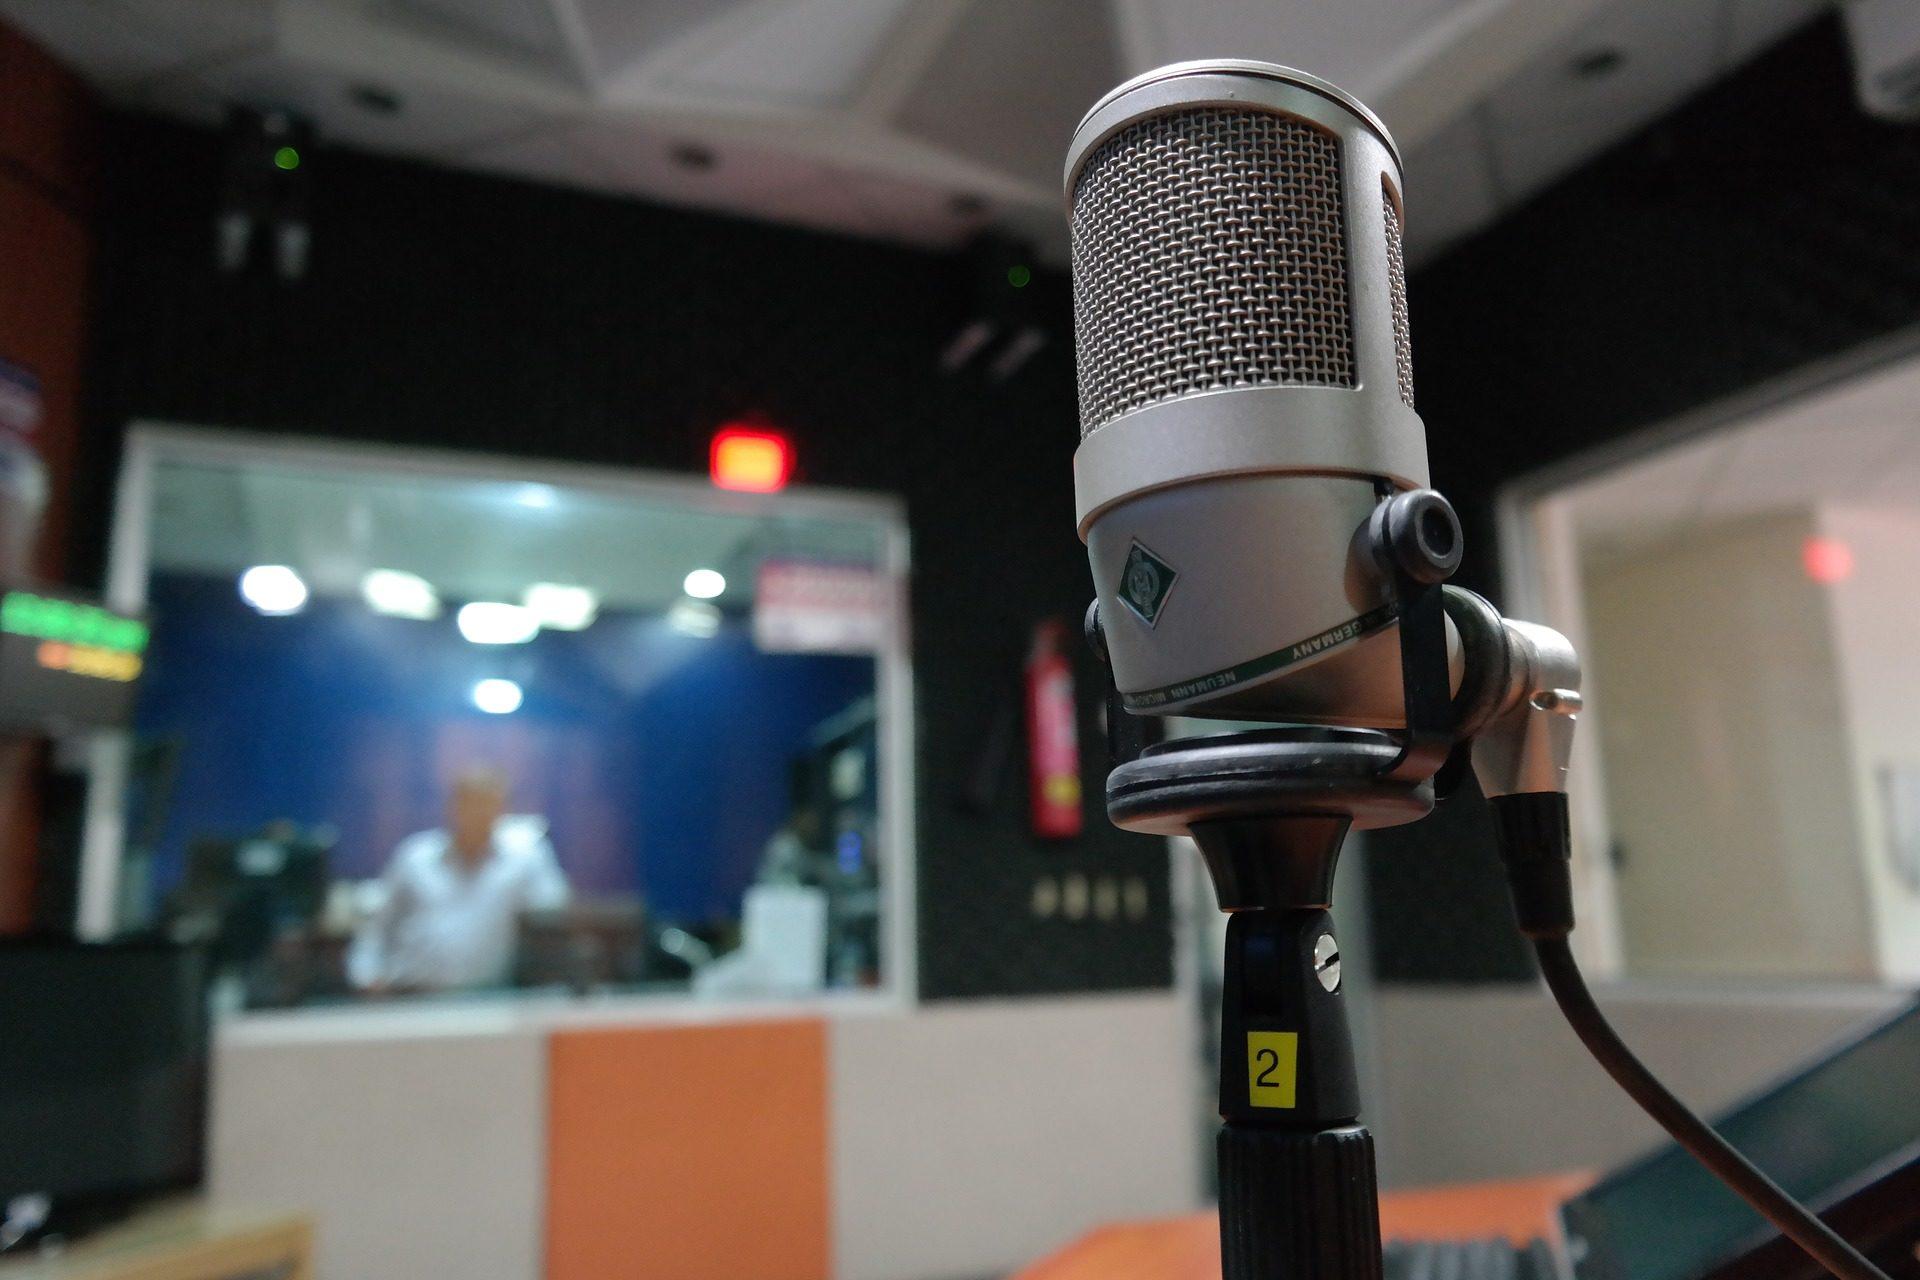 microfono-dia-mundial-radio-sonido-podcast-bbva